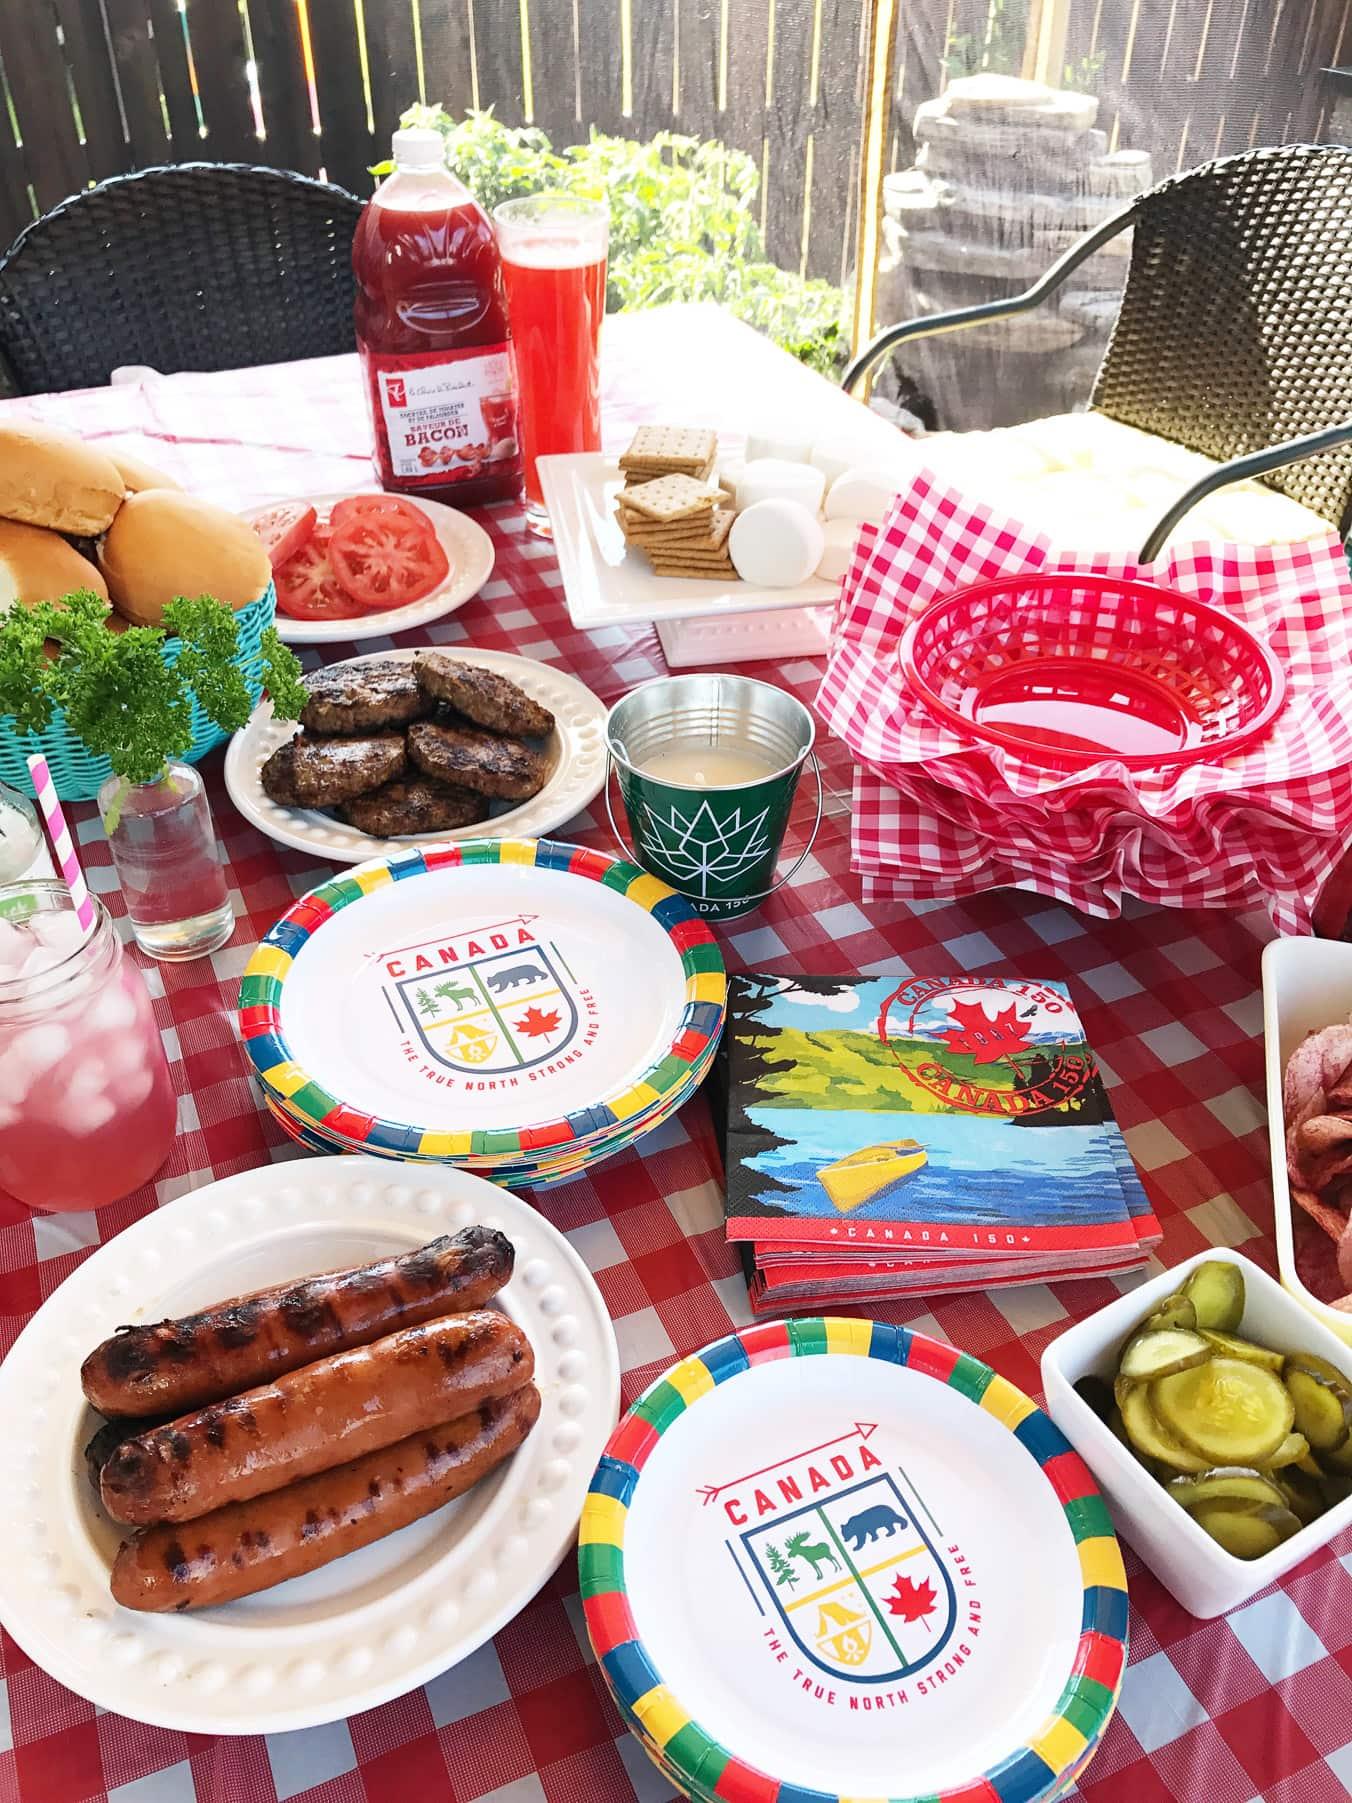 5 Tips for Hosting an Easy Summer BBQ